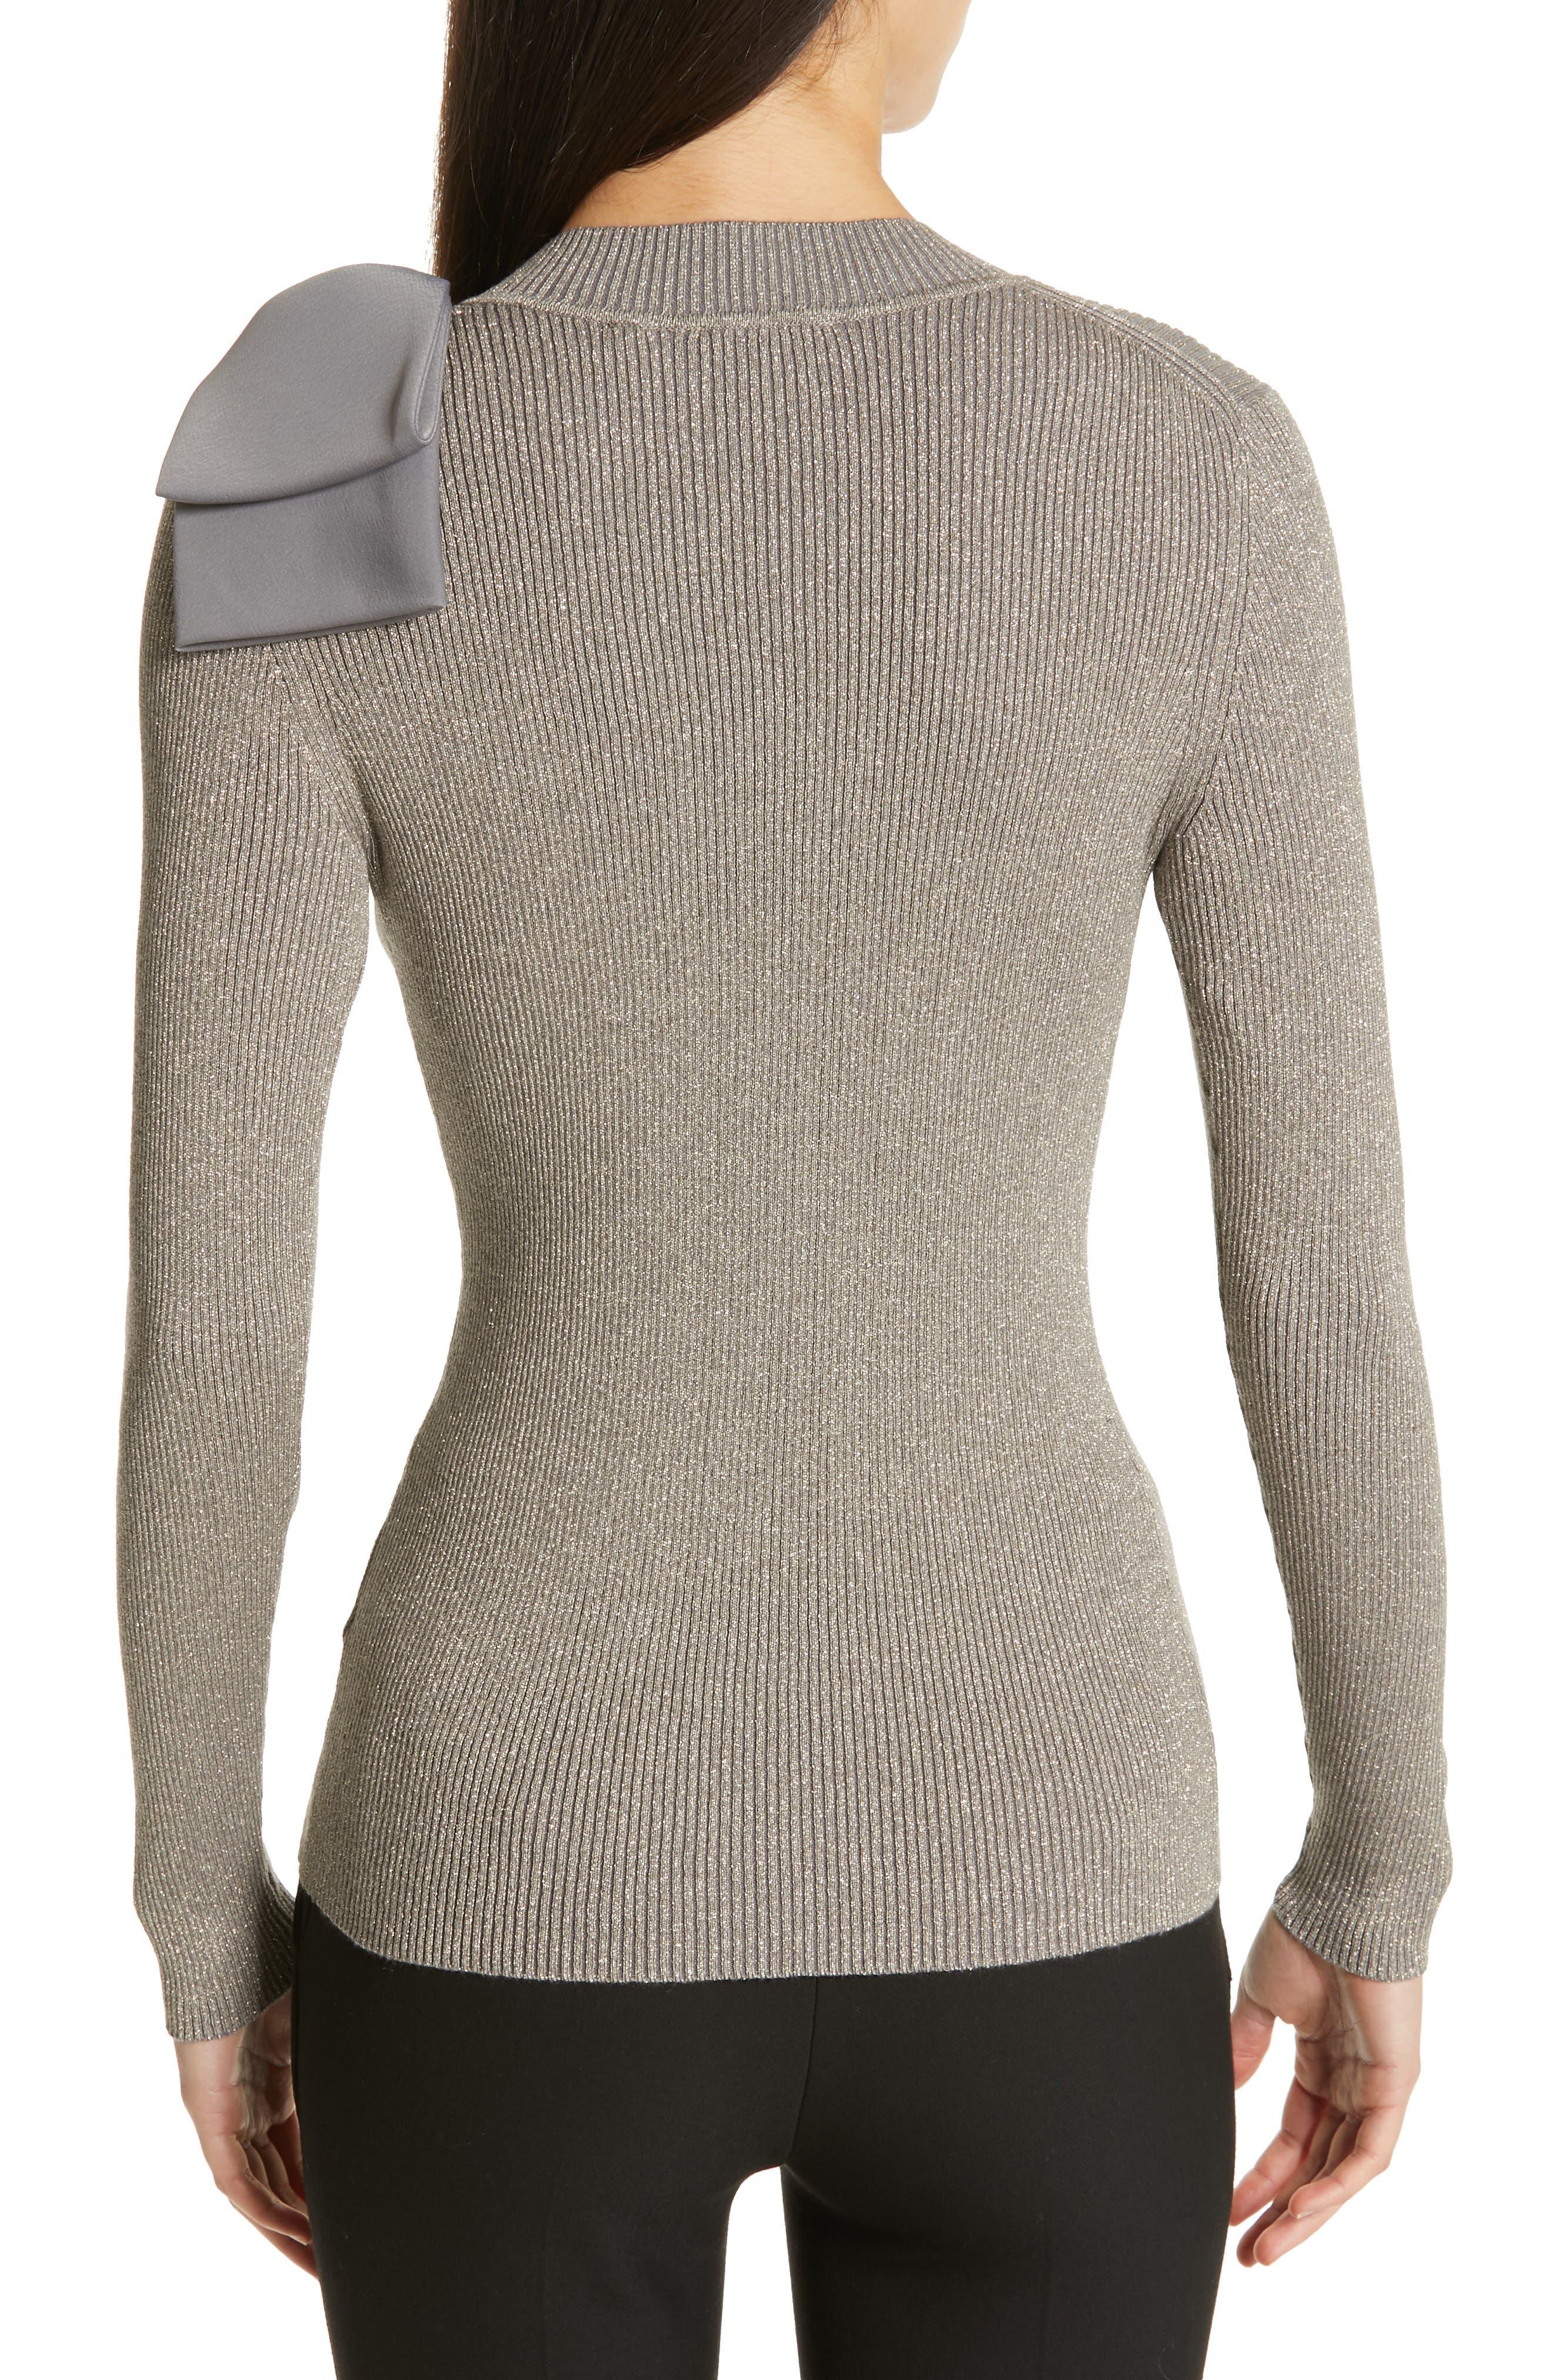 Saaydie Bow Trim Metallic Sweater,                             Alternate thumbnail 2, color,                             CHARCOAL